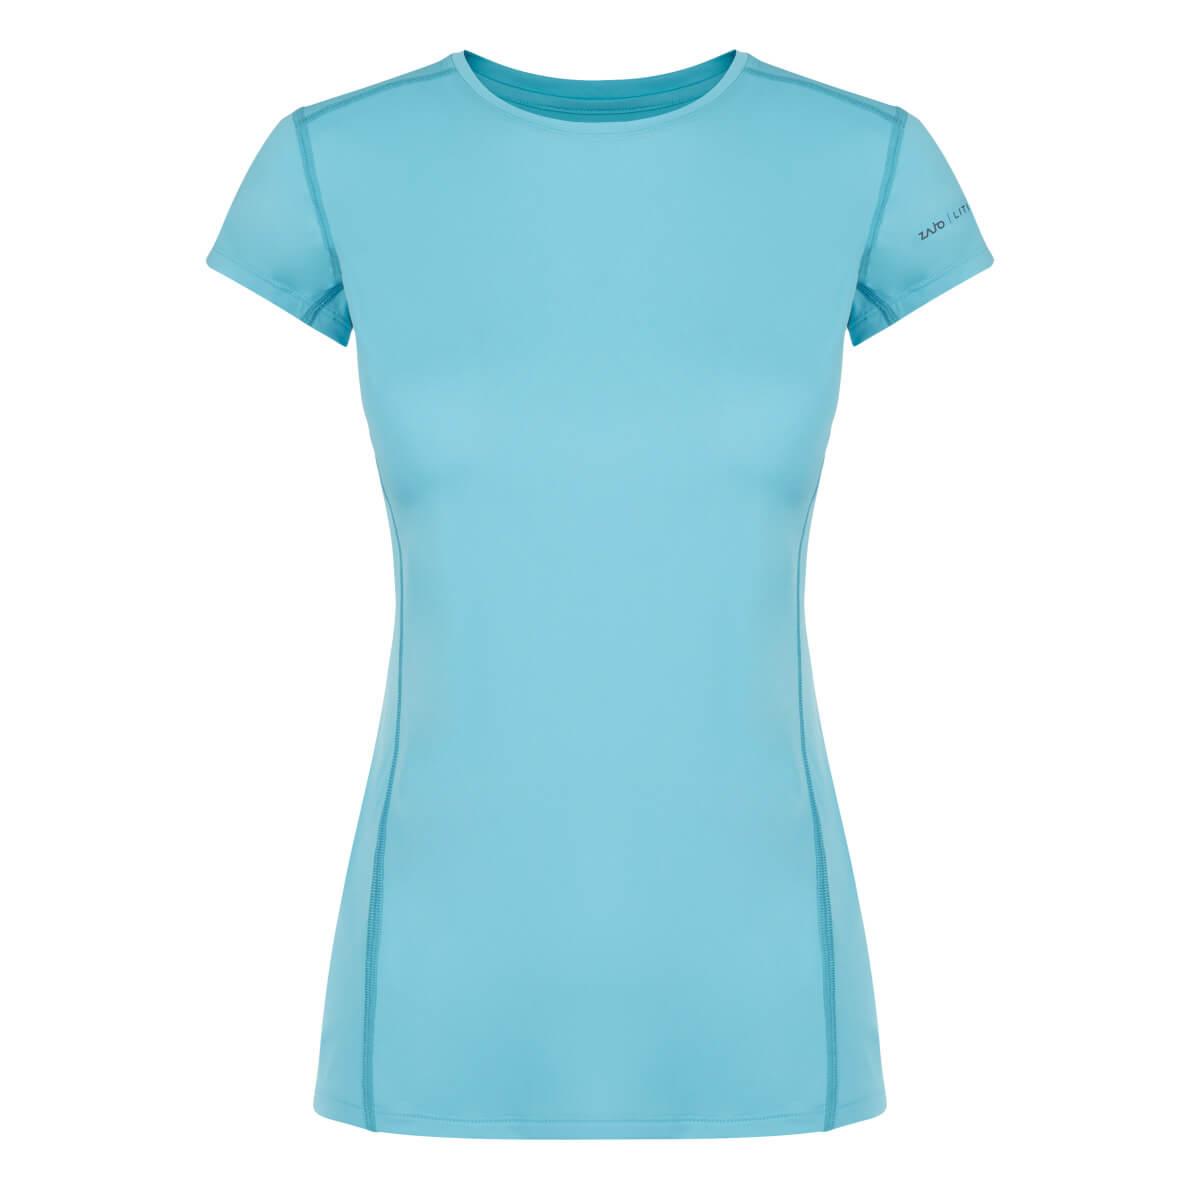 ZAJO Litio W T-shirt SS Bluefish dámske tričko - veľkosť XS